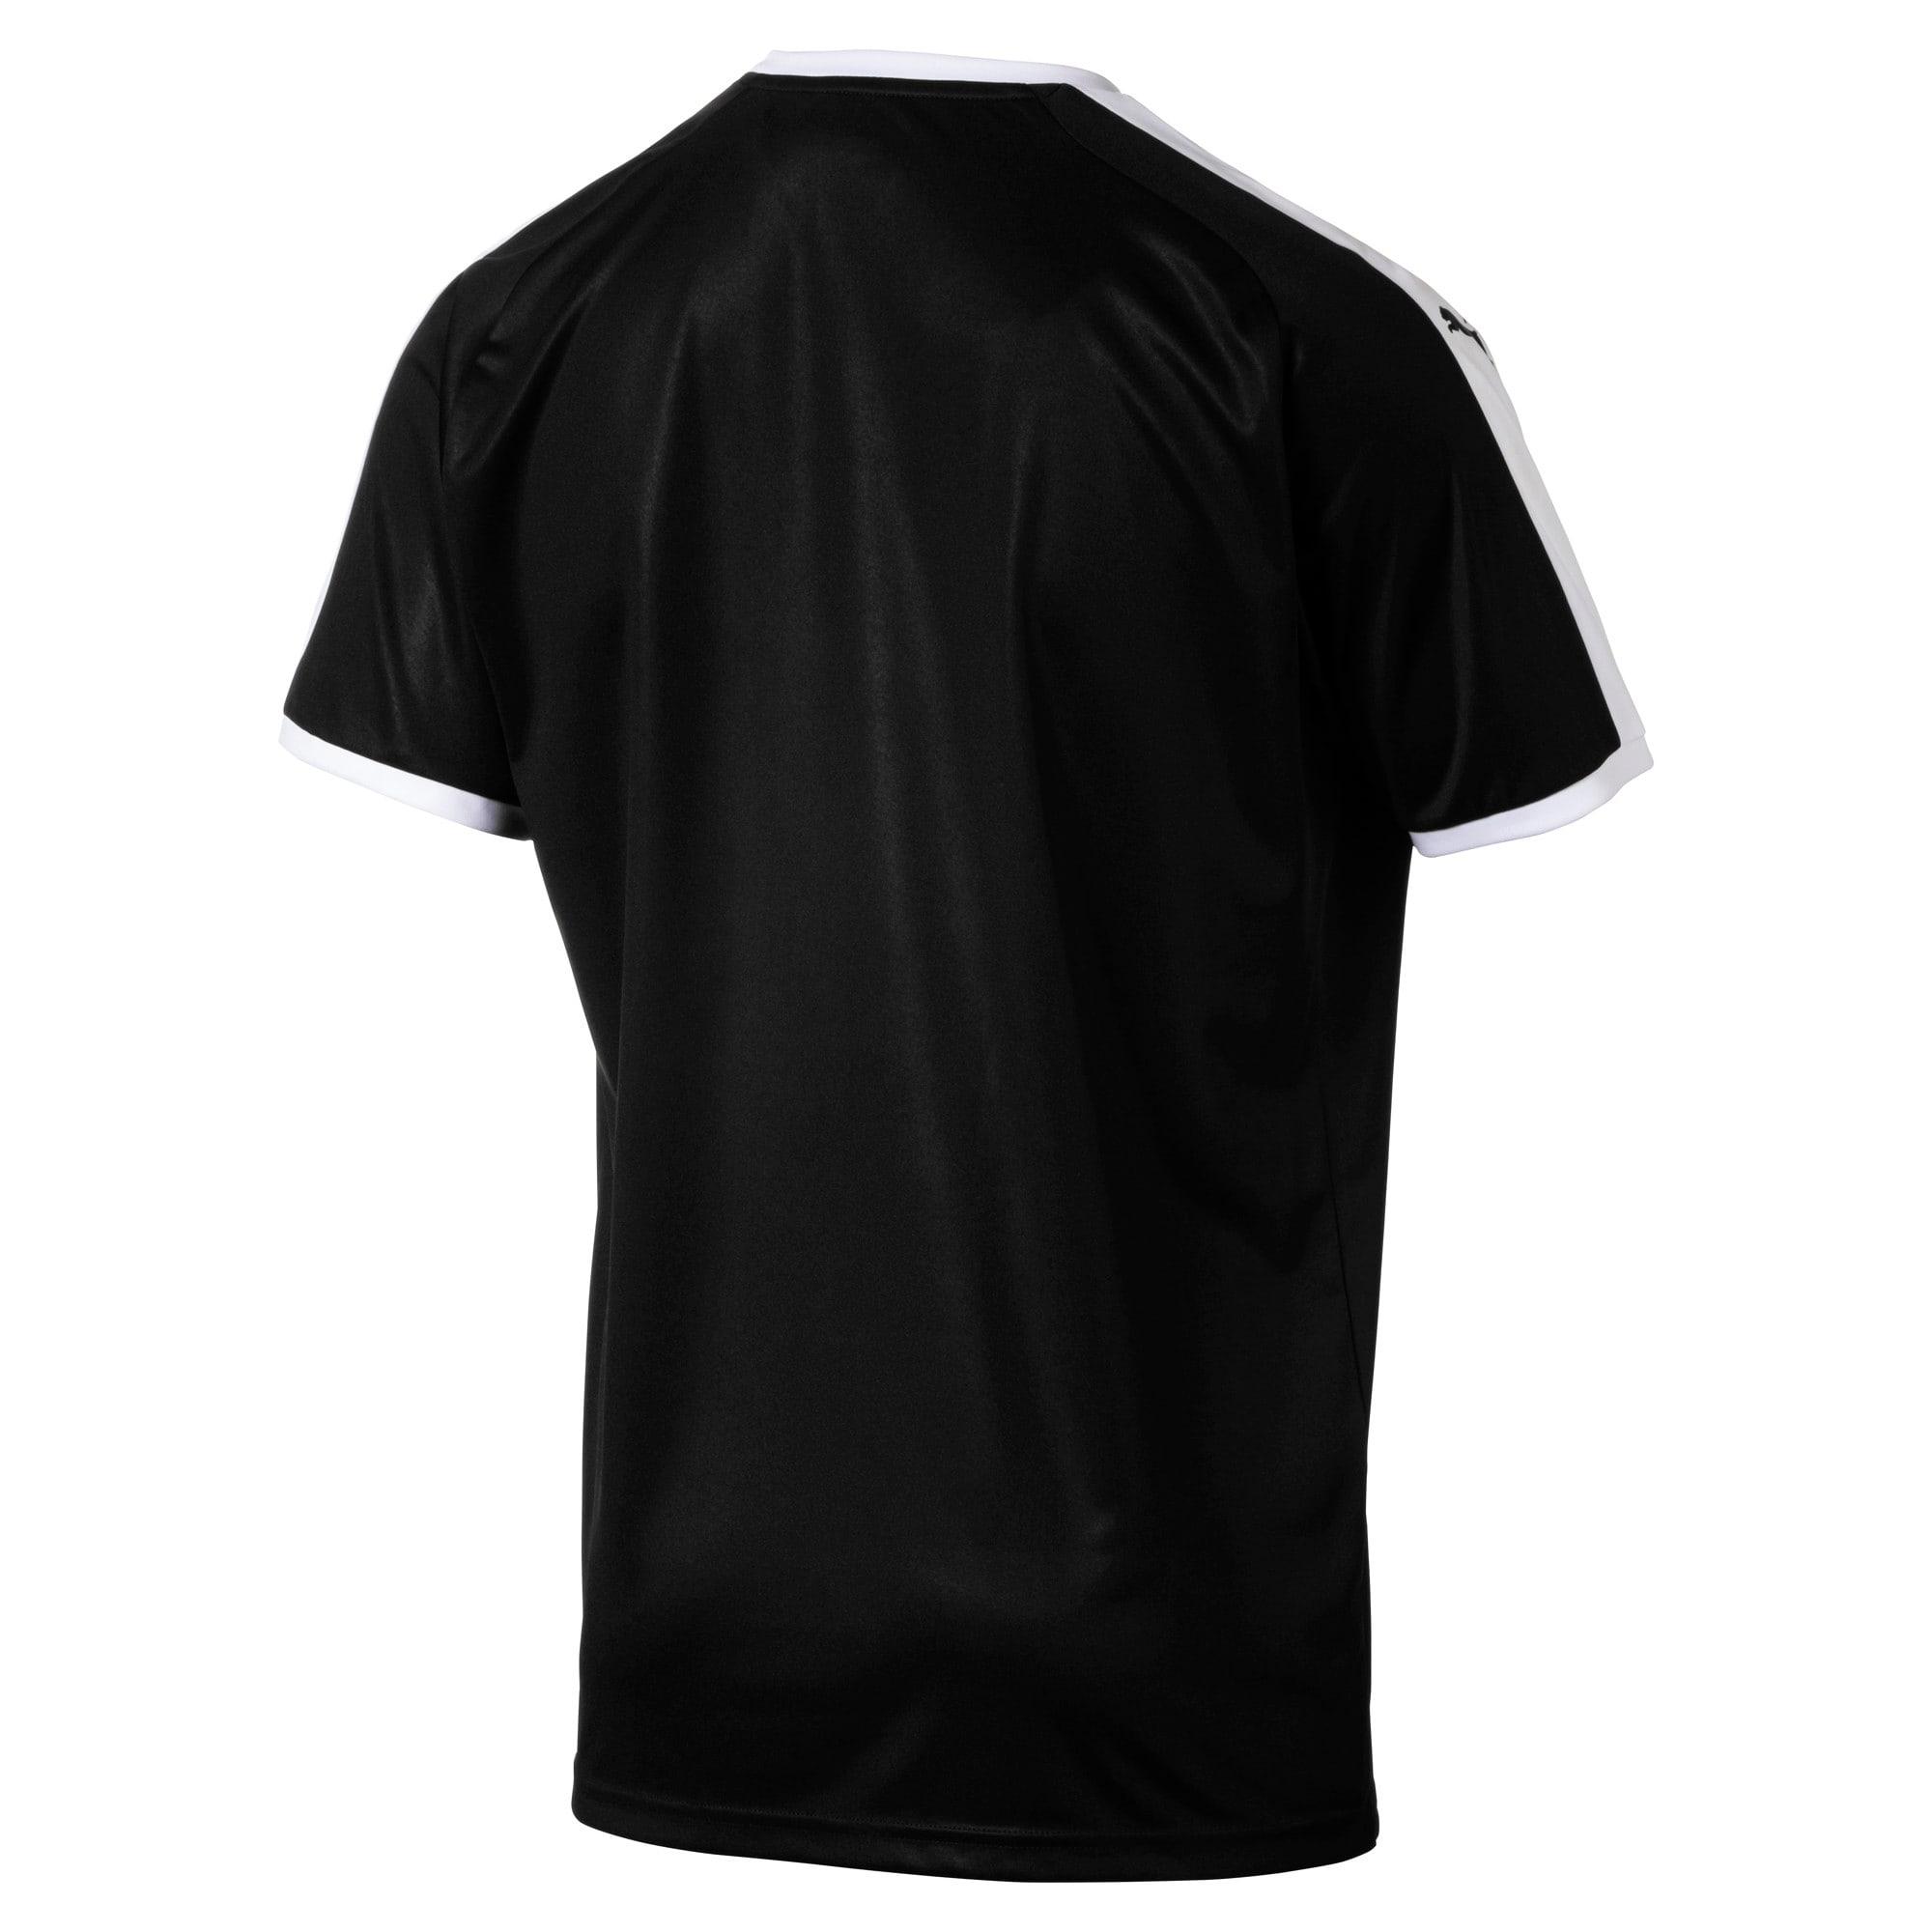 Thumbnail 5 of Liga shirt voor heren, Puma Black-Puma White, medium